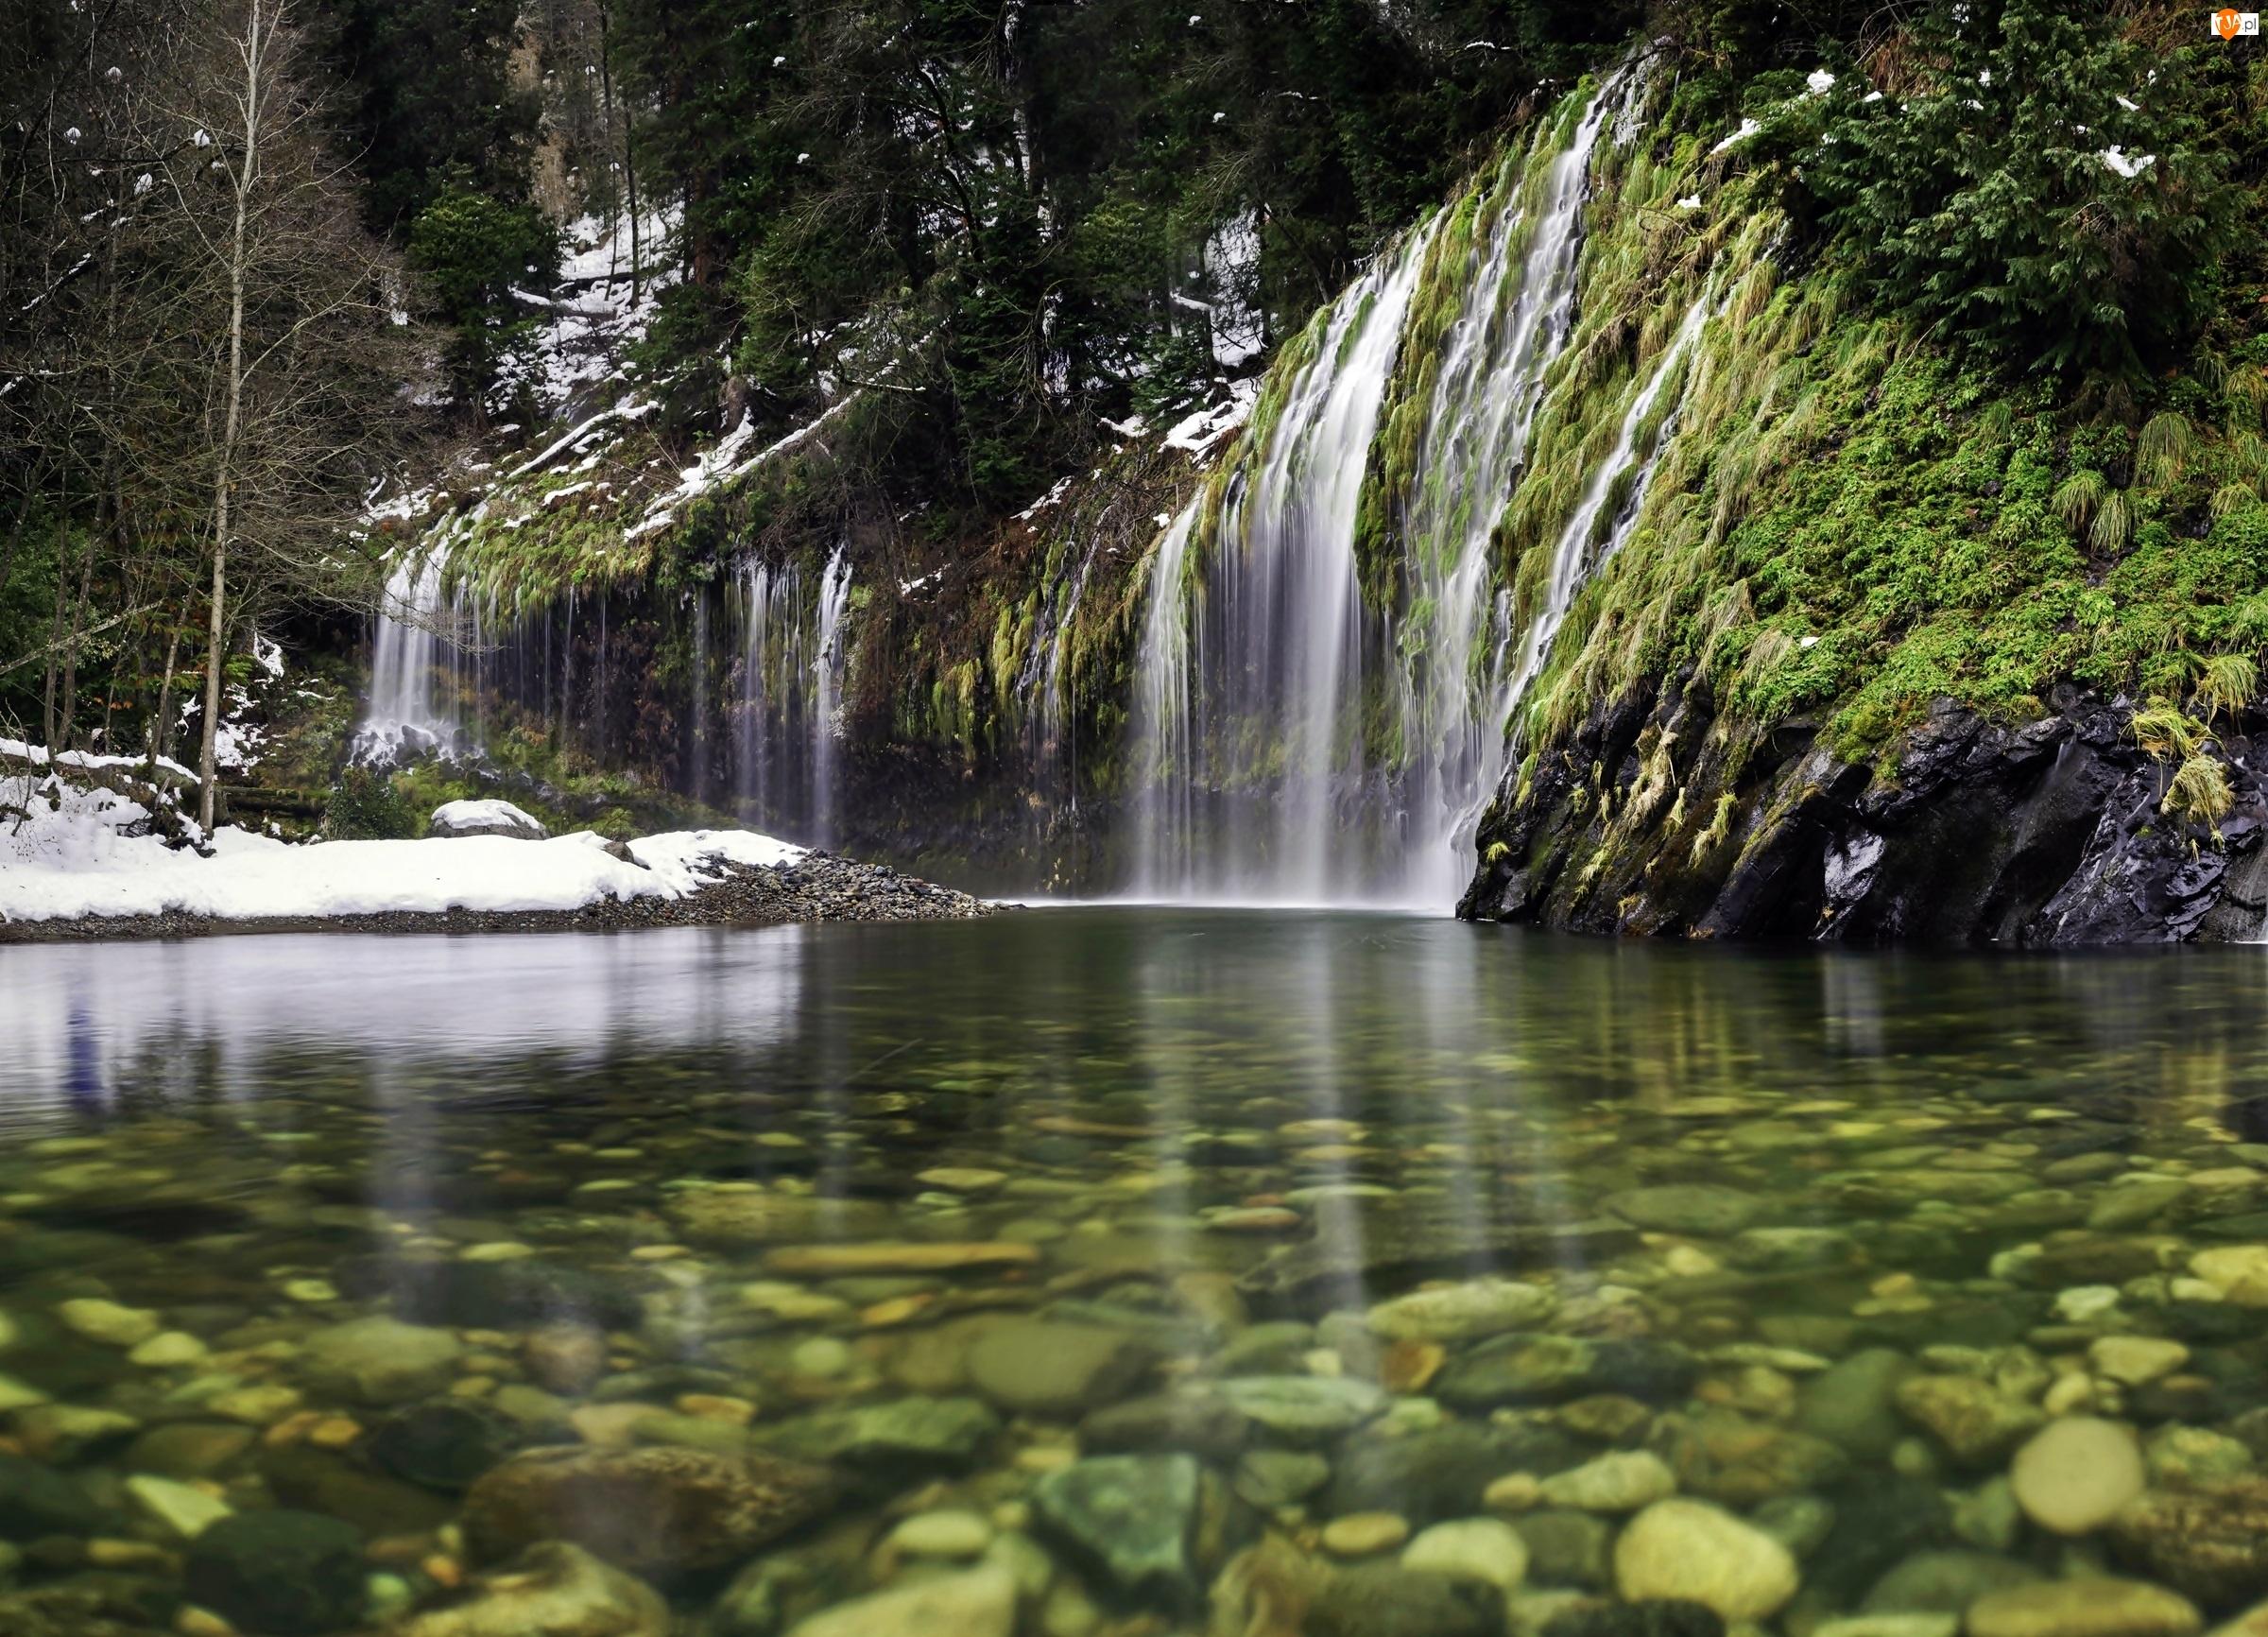 Sacramento, Mossbrae, Las, Kalifornia, Rzeka, Wodospad